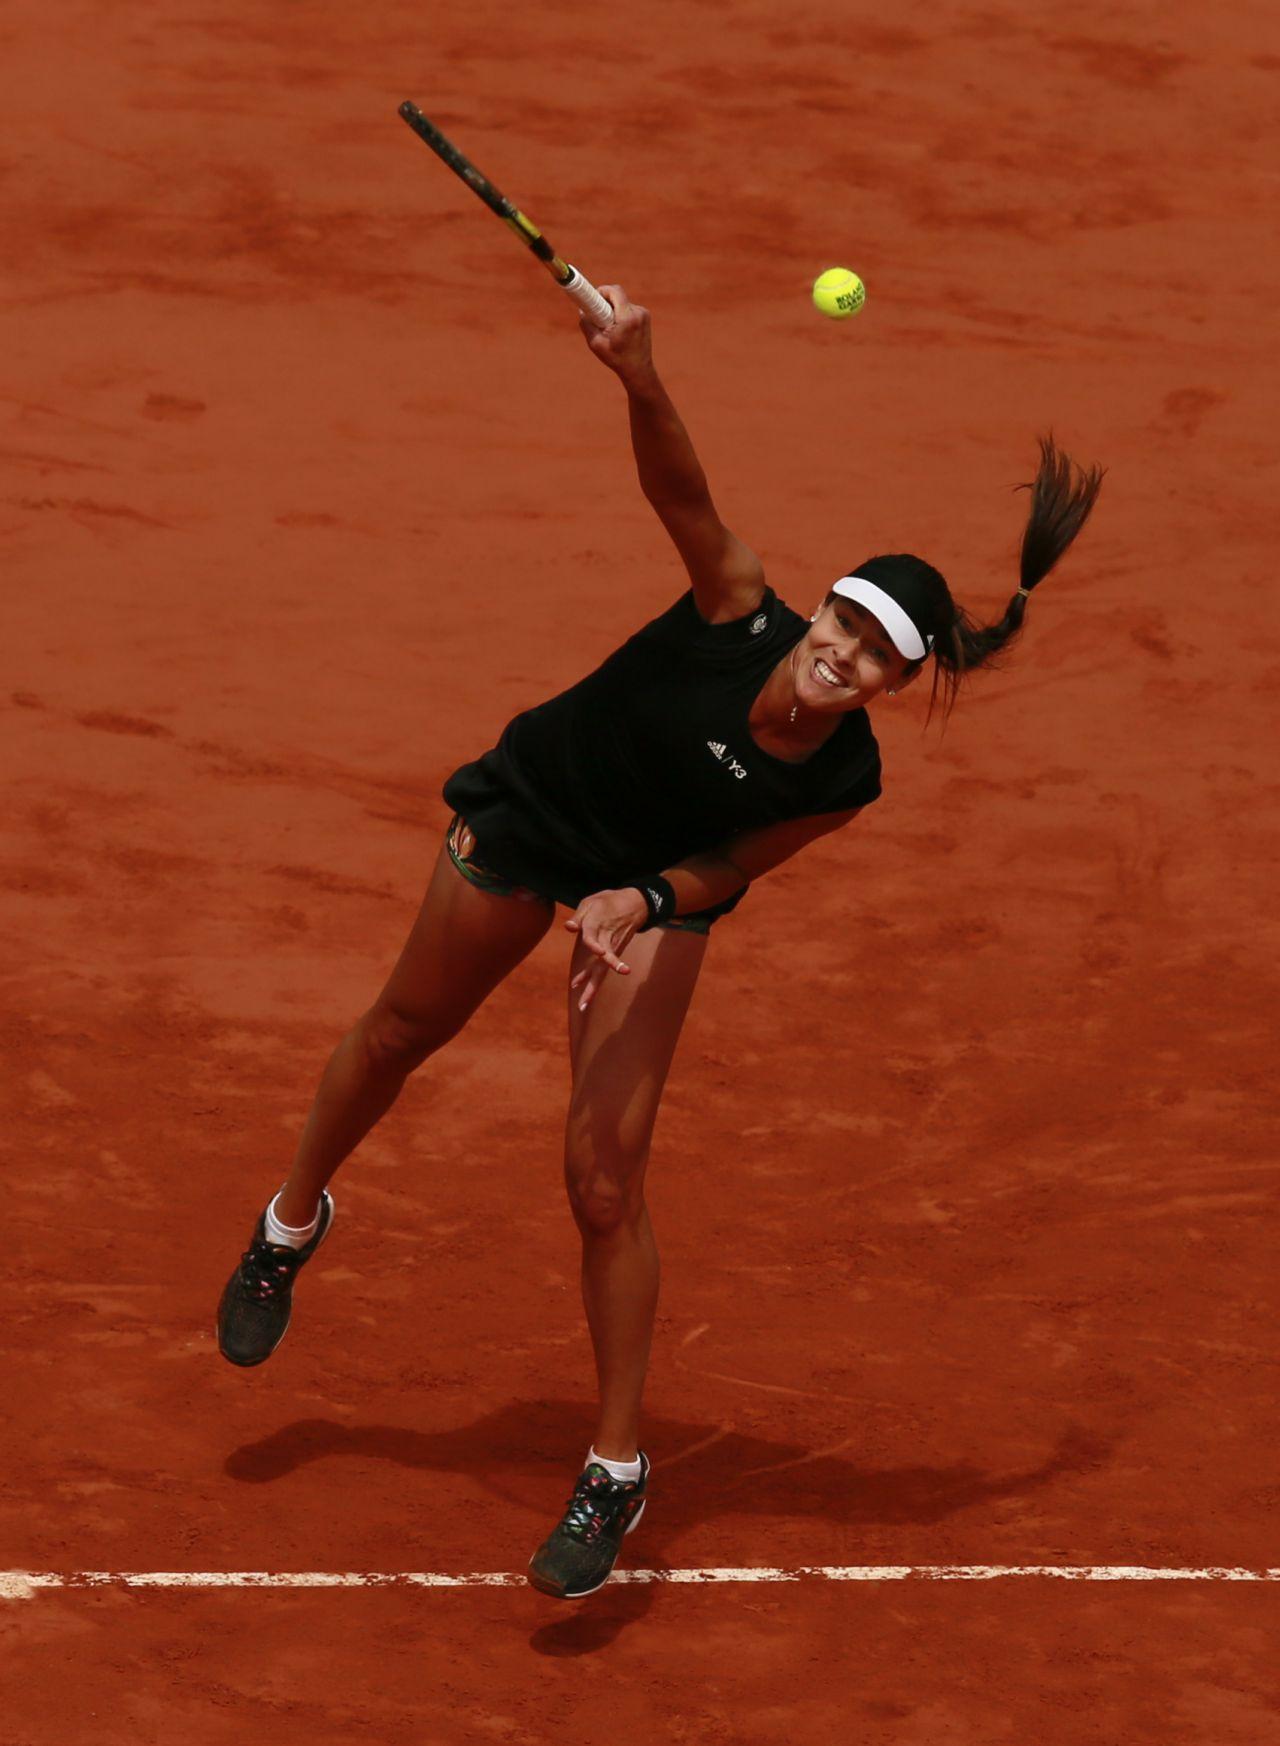 71492cb7094c1 Ana Ivanovic – 2015 French Tennis Open at Roland Garros in Paris –  Quarterfinals